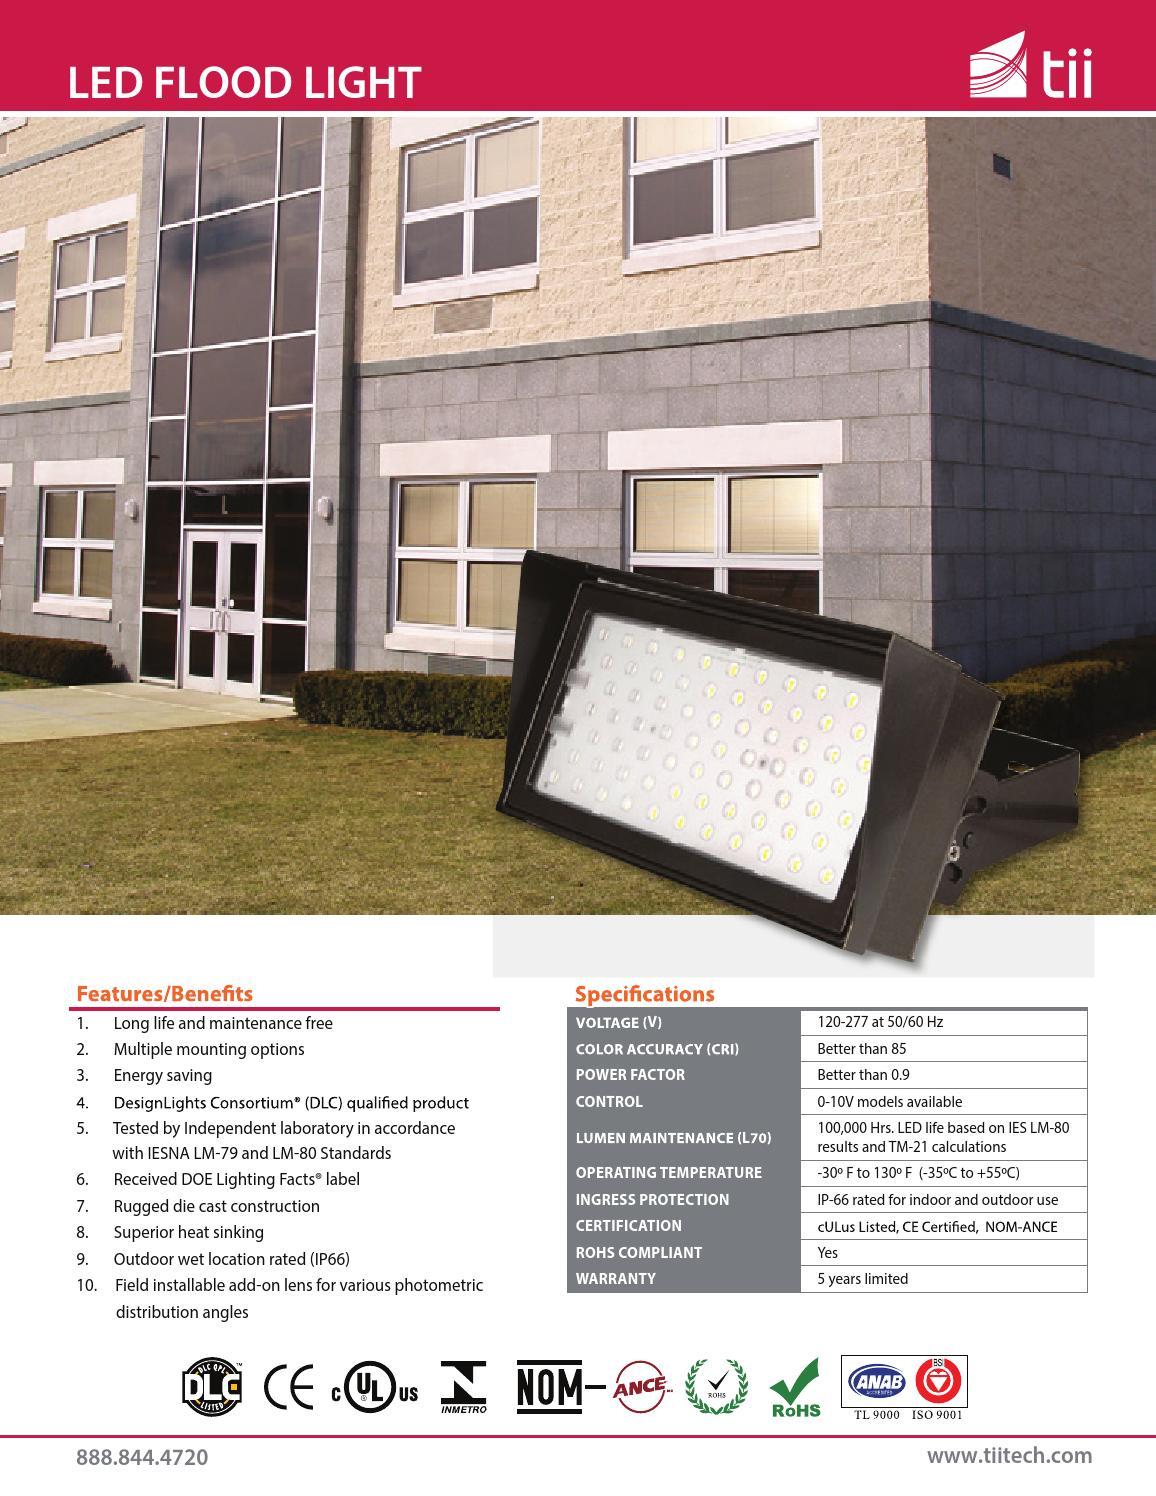 LED Flood Light Tii By Advantek LED Lighting Solutions Issuu